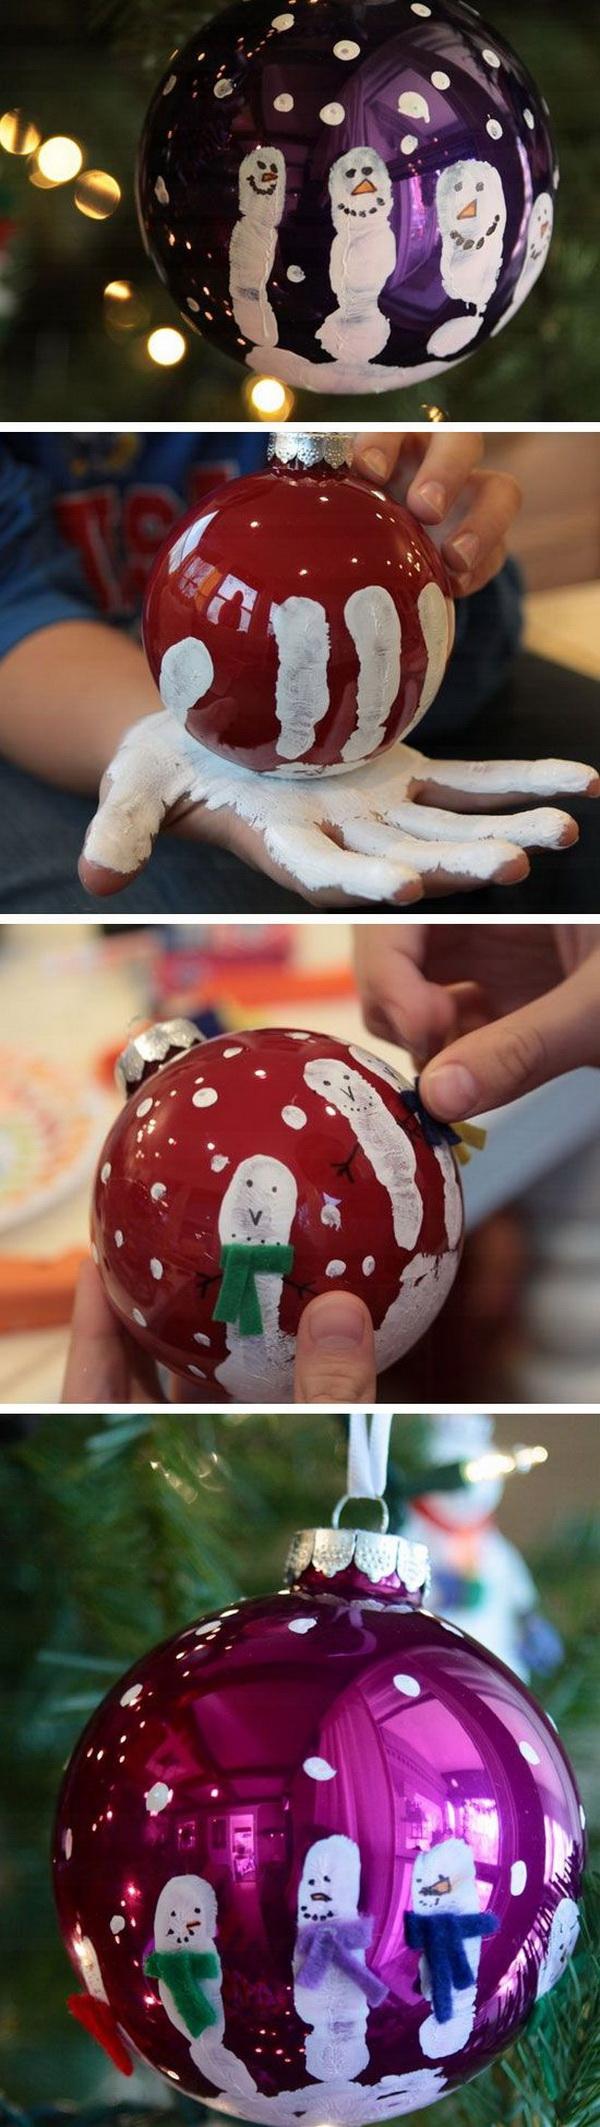 Handprint Christmas Ornaments. Create some cute handprint Christmas tree ornaments using green sparkly salt dough and paints!